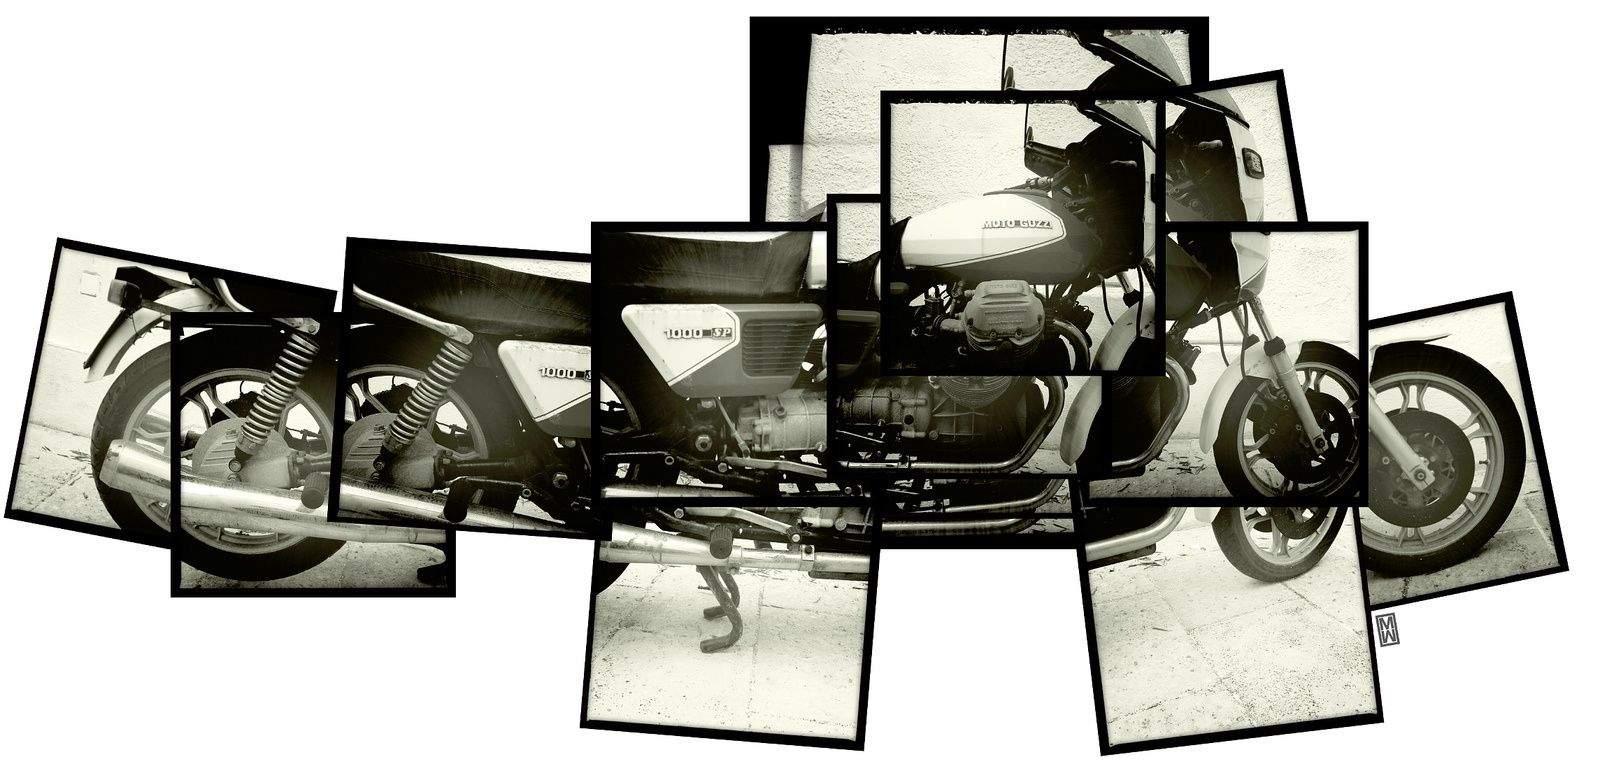 """My 1983 Moto Guzzi SP 1000.""  @Matthew Watkins. Hipstamatic + PS."